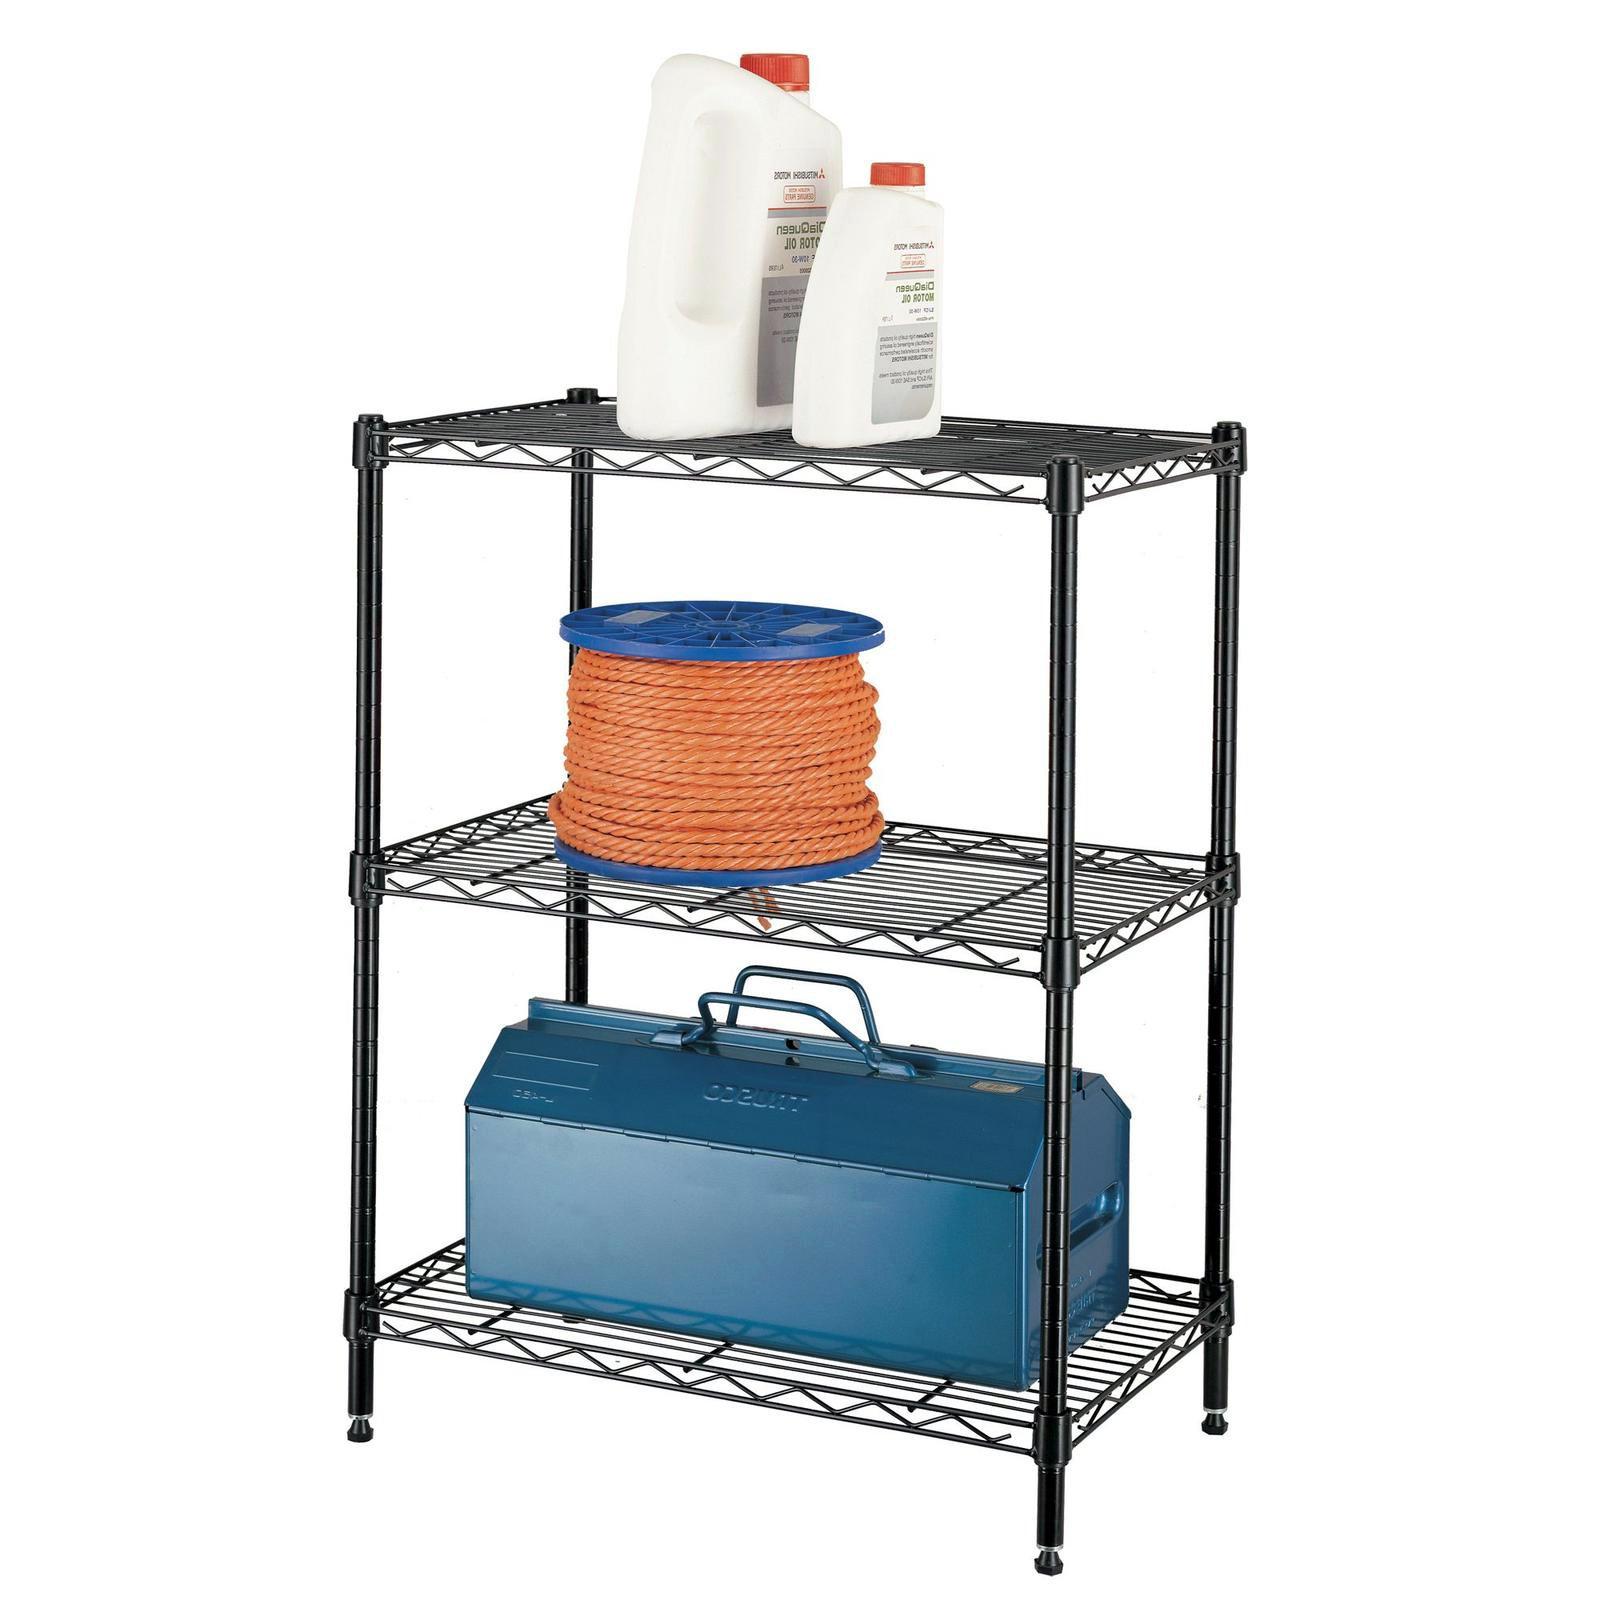 Garage Storage 3 Tier Shelving Unit Black Deep Shelves